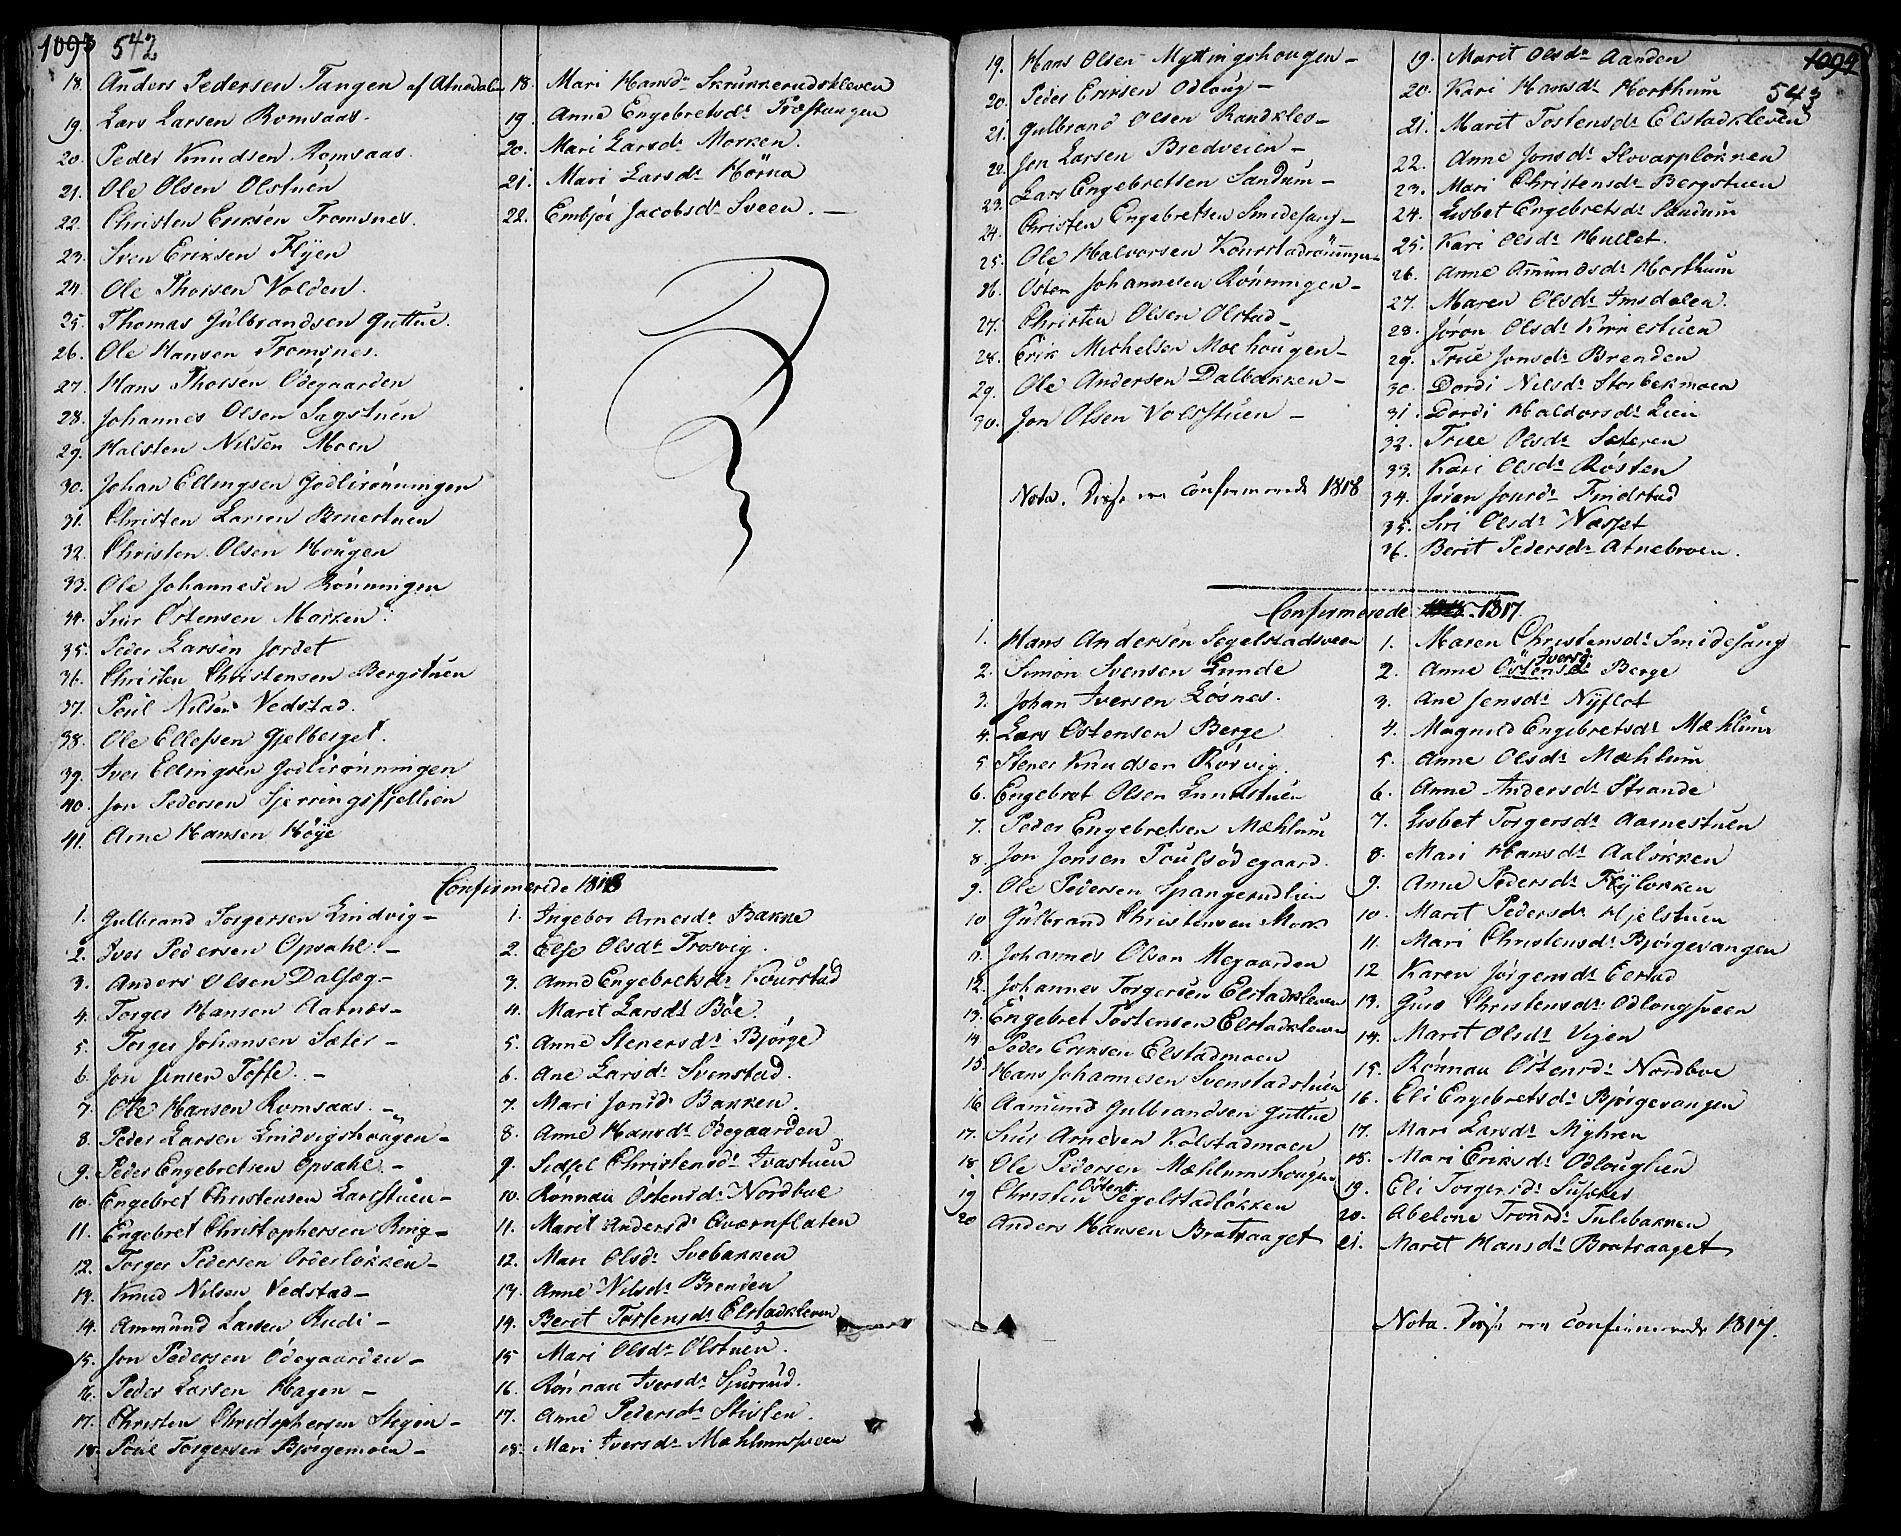 SAH, Ringebu prestekontor, Ministerialbok nr. 3, 1781-1820, s. 542-543